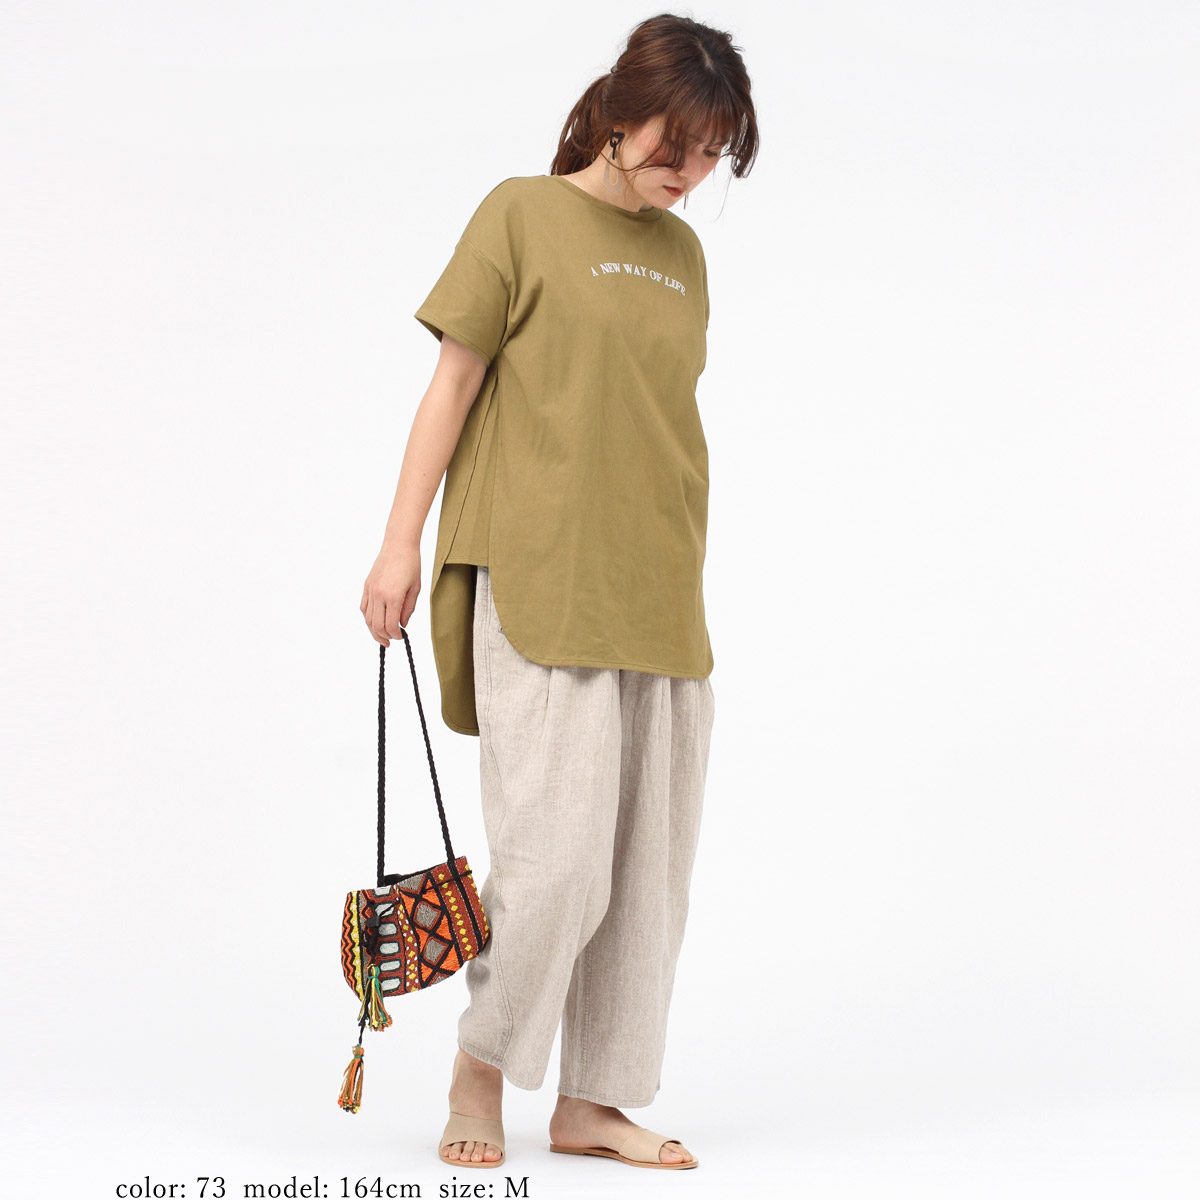 【NEW SALE】Cafetty ラウンドヘムP/O CF6010